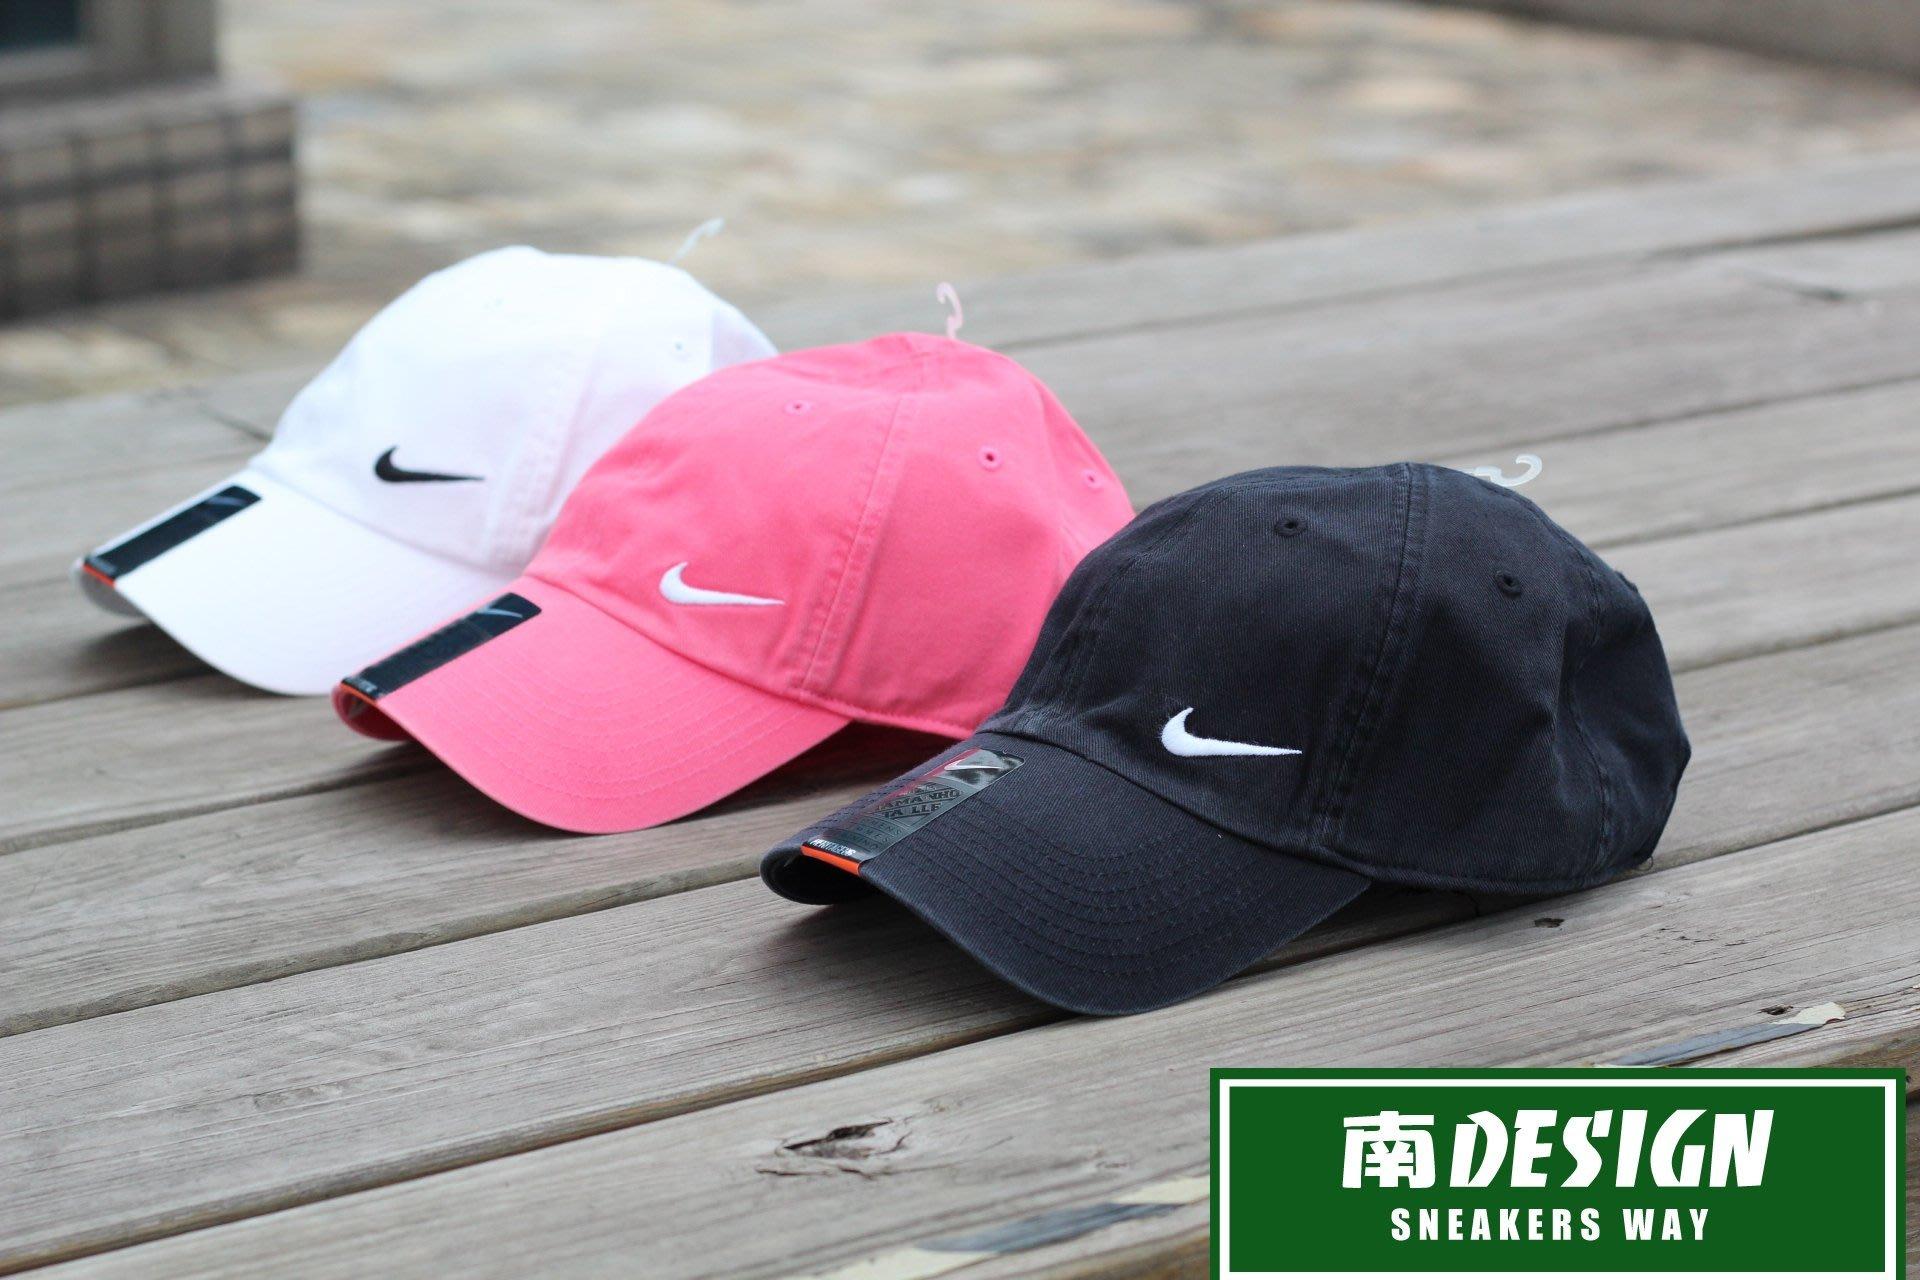 南◇2017 10月 NIKE HERITAGE SWOOSH CAP 粉紅黑白色 老帽 復古帽子 371232-010